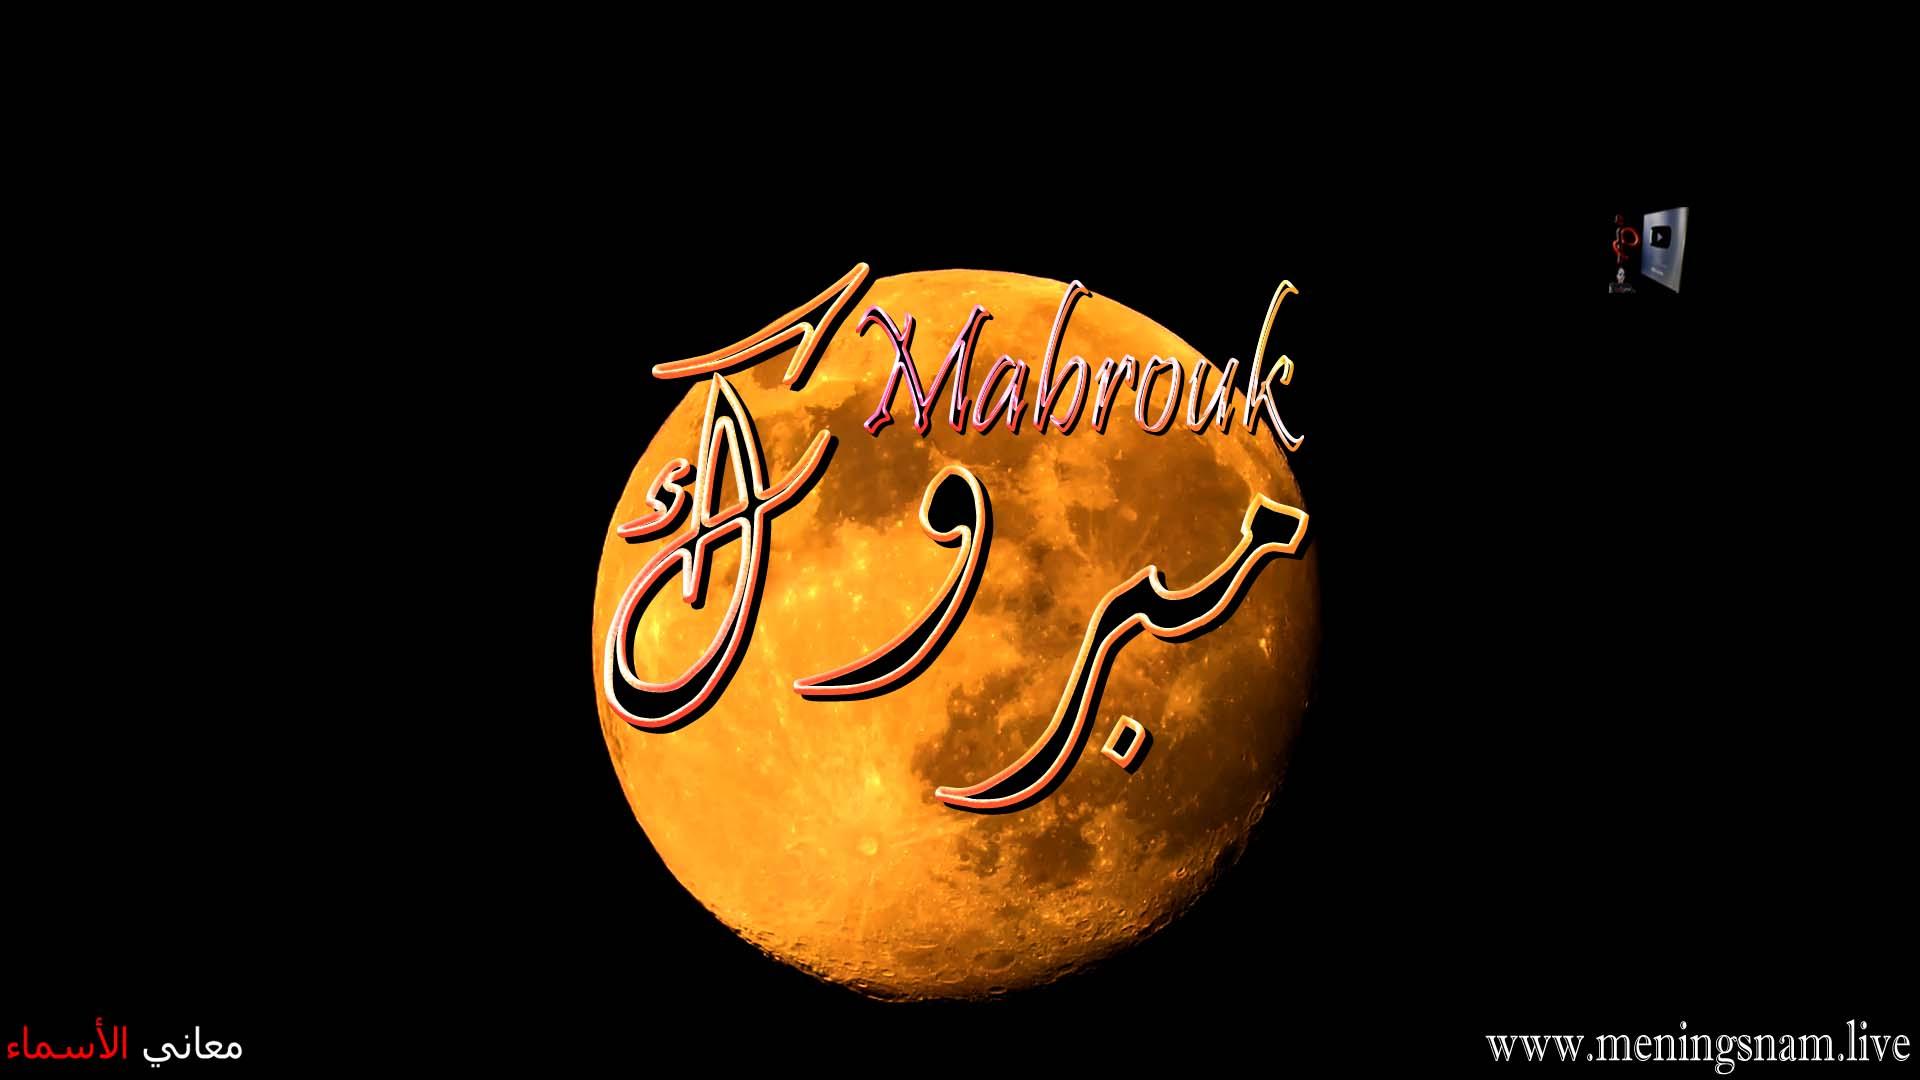 mabrouk,mabrouk el mechri,mabrouk tunisie,mabrouk means,mabrouk meaning,mabrouk alghero,mabrouk mabrouk,mabrouk in arabic,mabrouk haarlem,mabrouk in english, معنى اسم مبروك, وصفات حامل, هذا الاسم, Mabrouk,